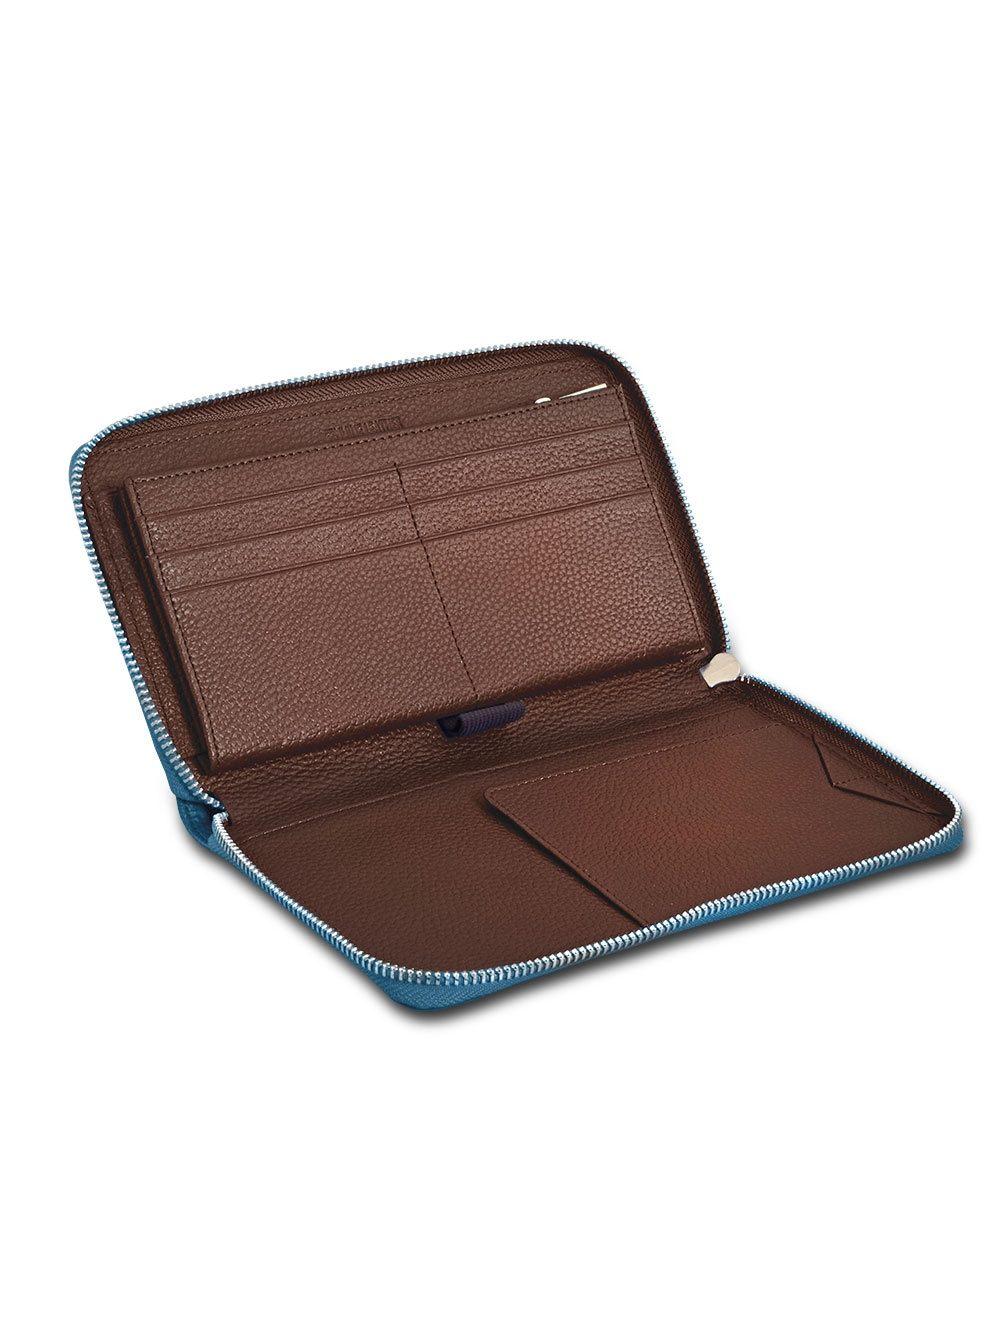 Princeton Wallet - Turquoise